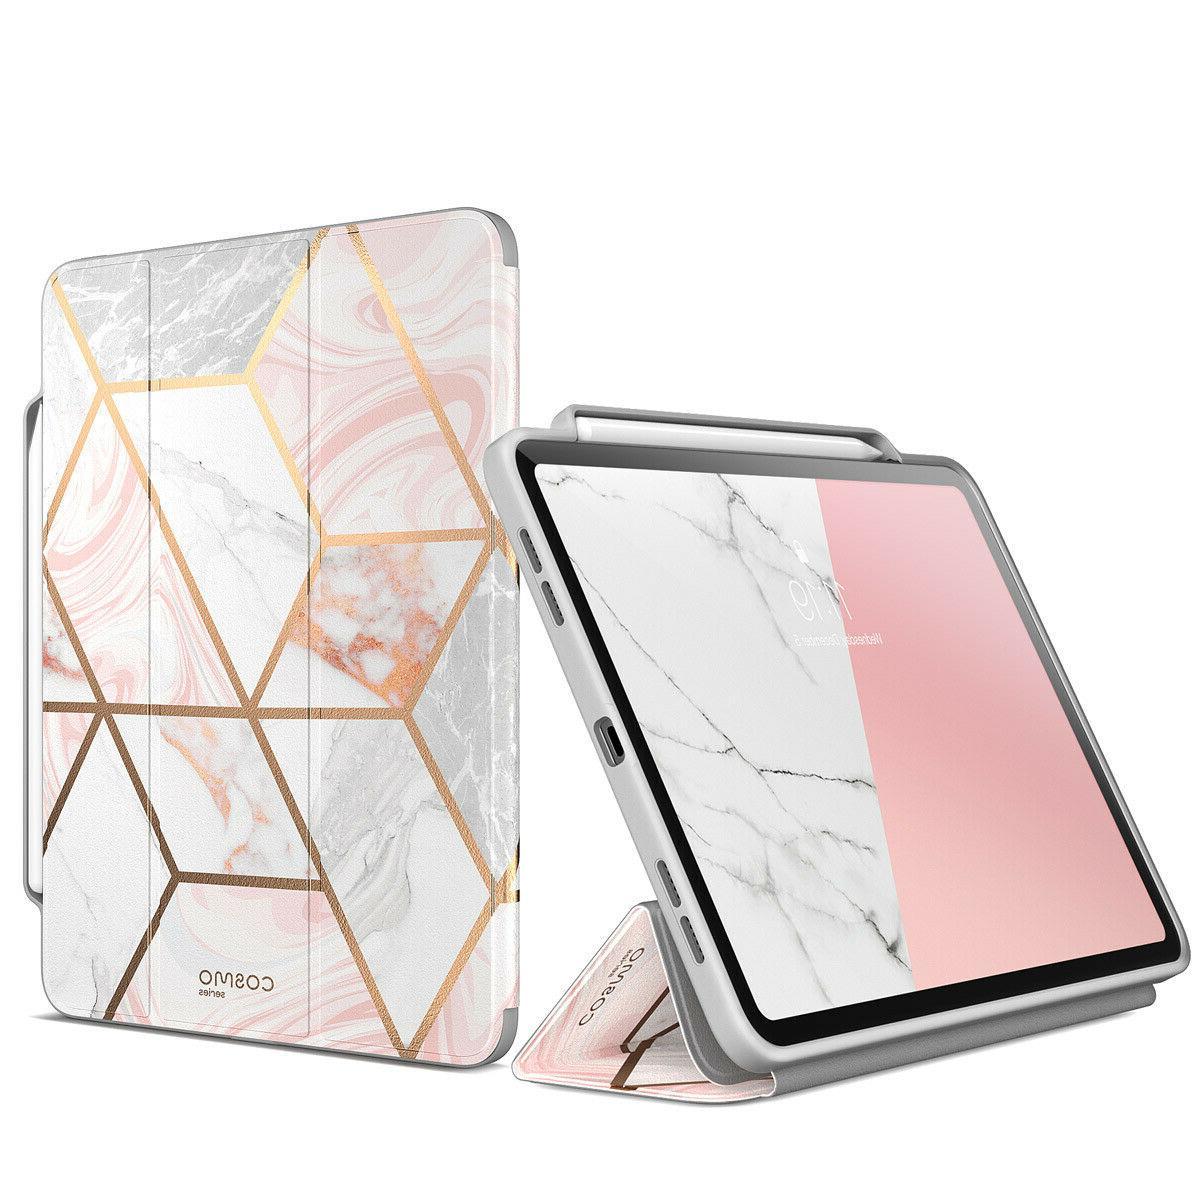 new ipad pro 11 12 9 case